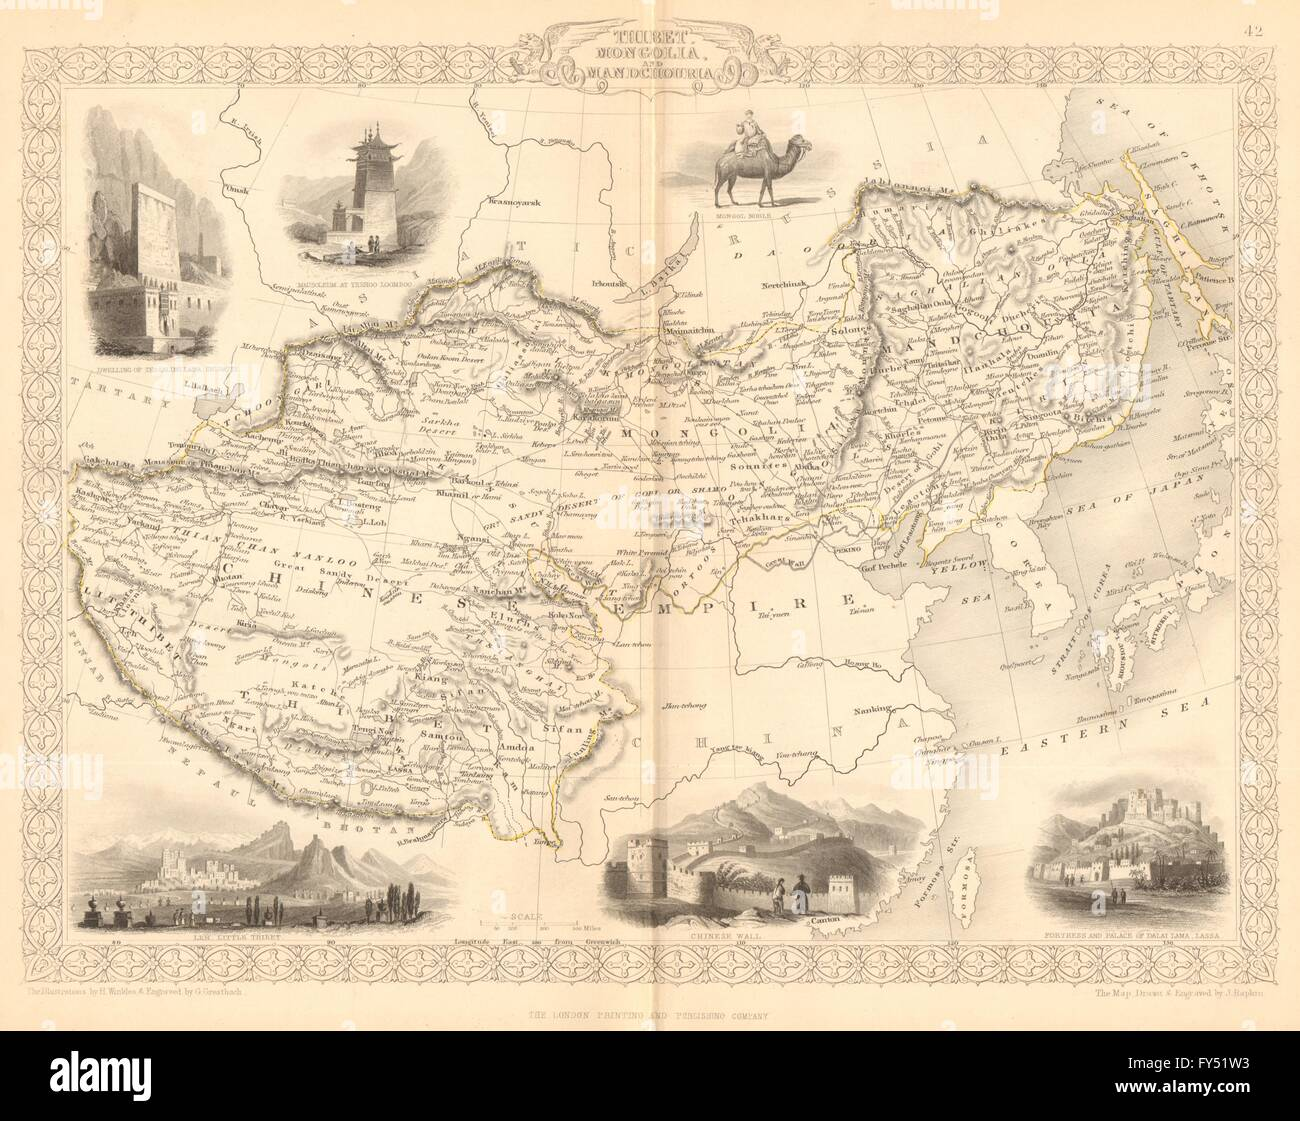 Lhasa China Map.Thibet Mongolia Mandchouria Tibet Manchuria Lhasa Stock Photo